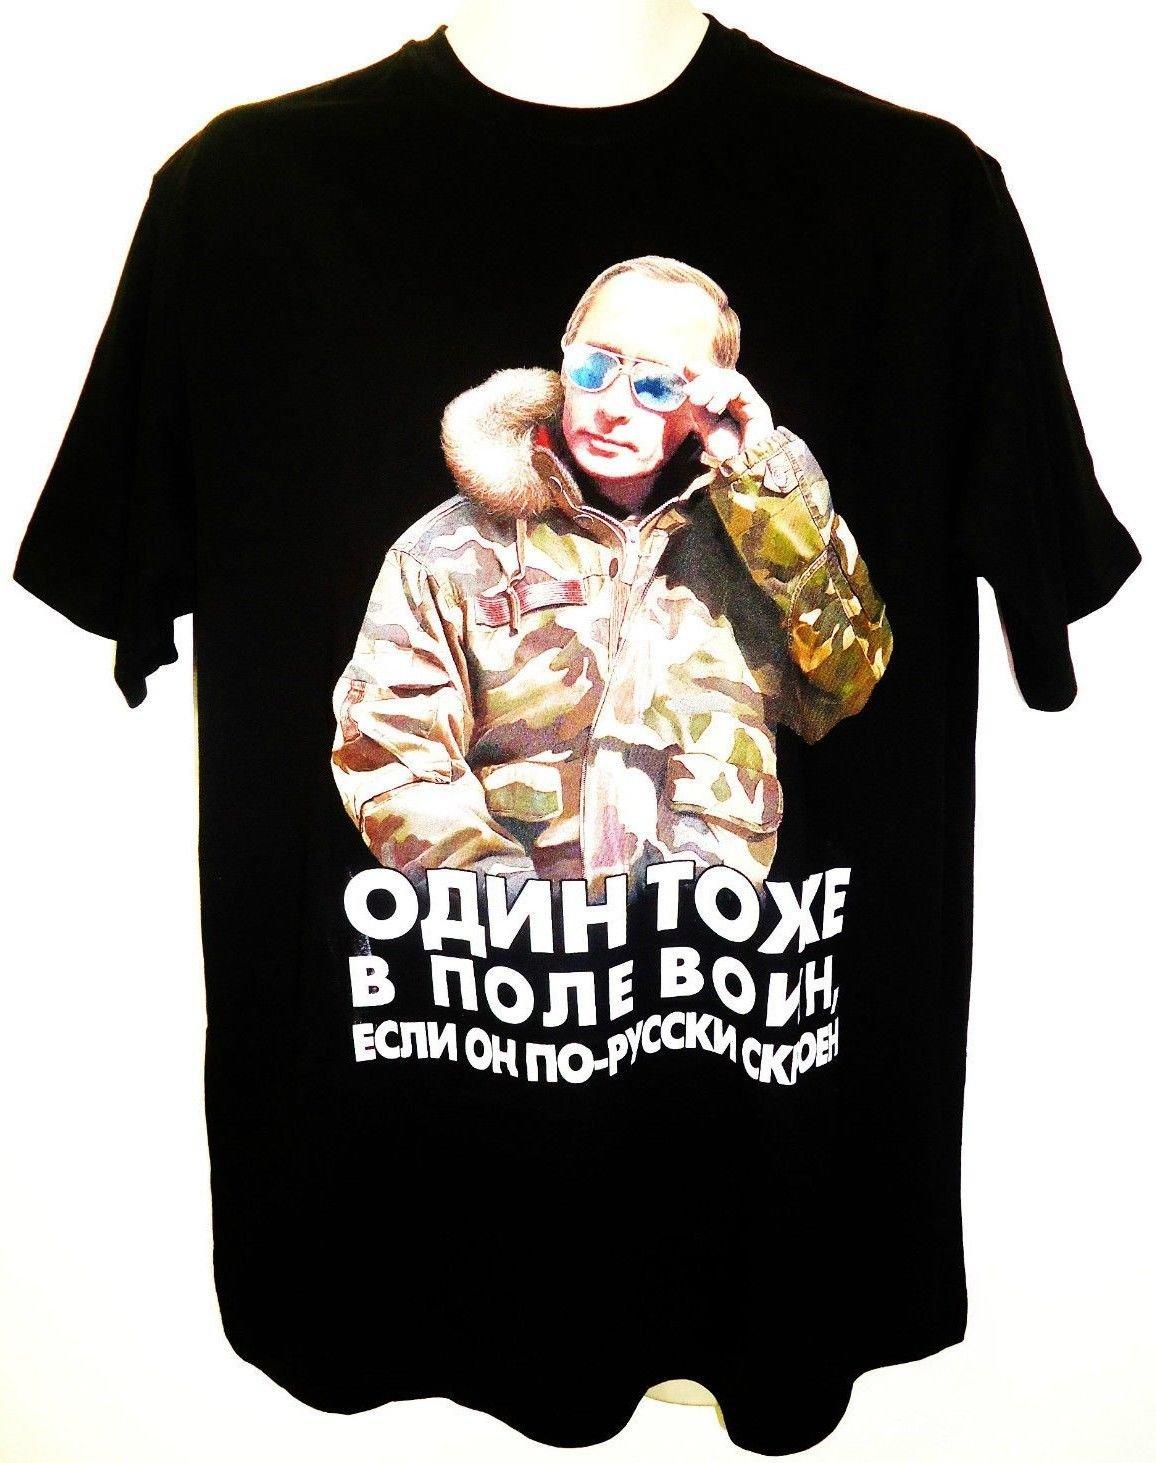 VLADIMIR - PUTIN - RUSSIA - MEDIUM - CAMO - BLACK - MILITARY - T-SHIRT - NEW